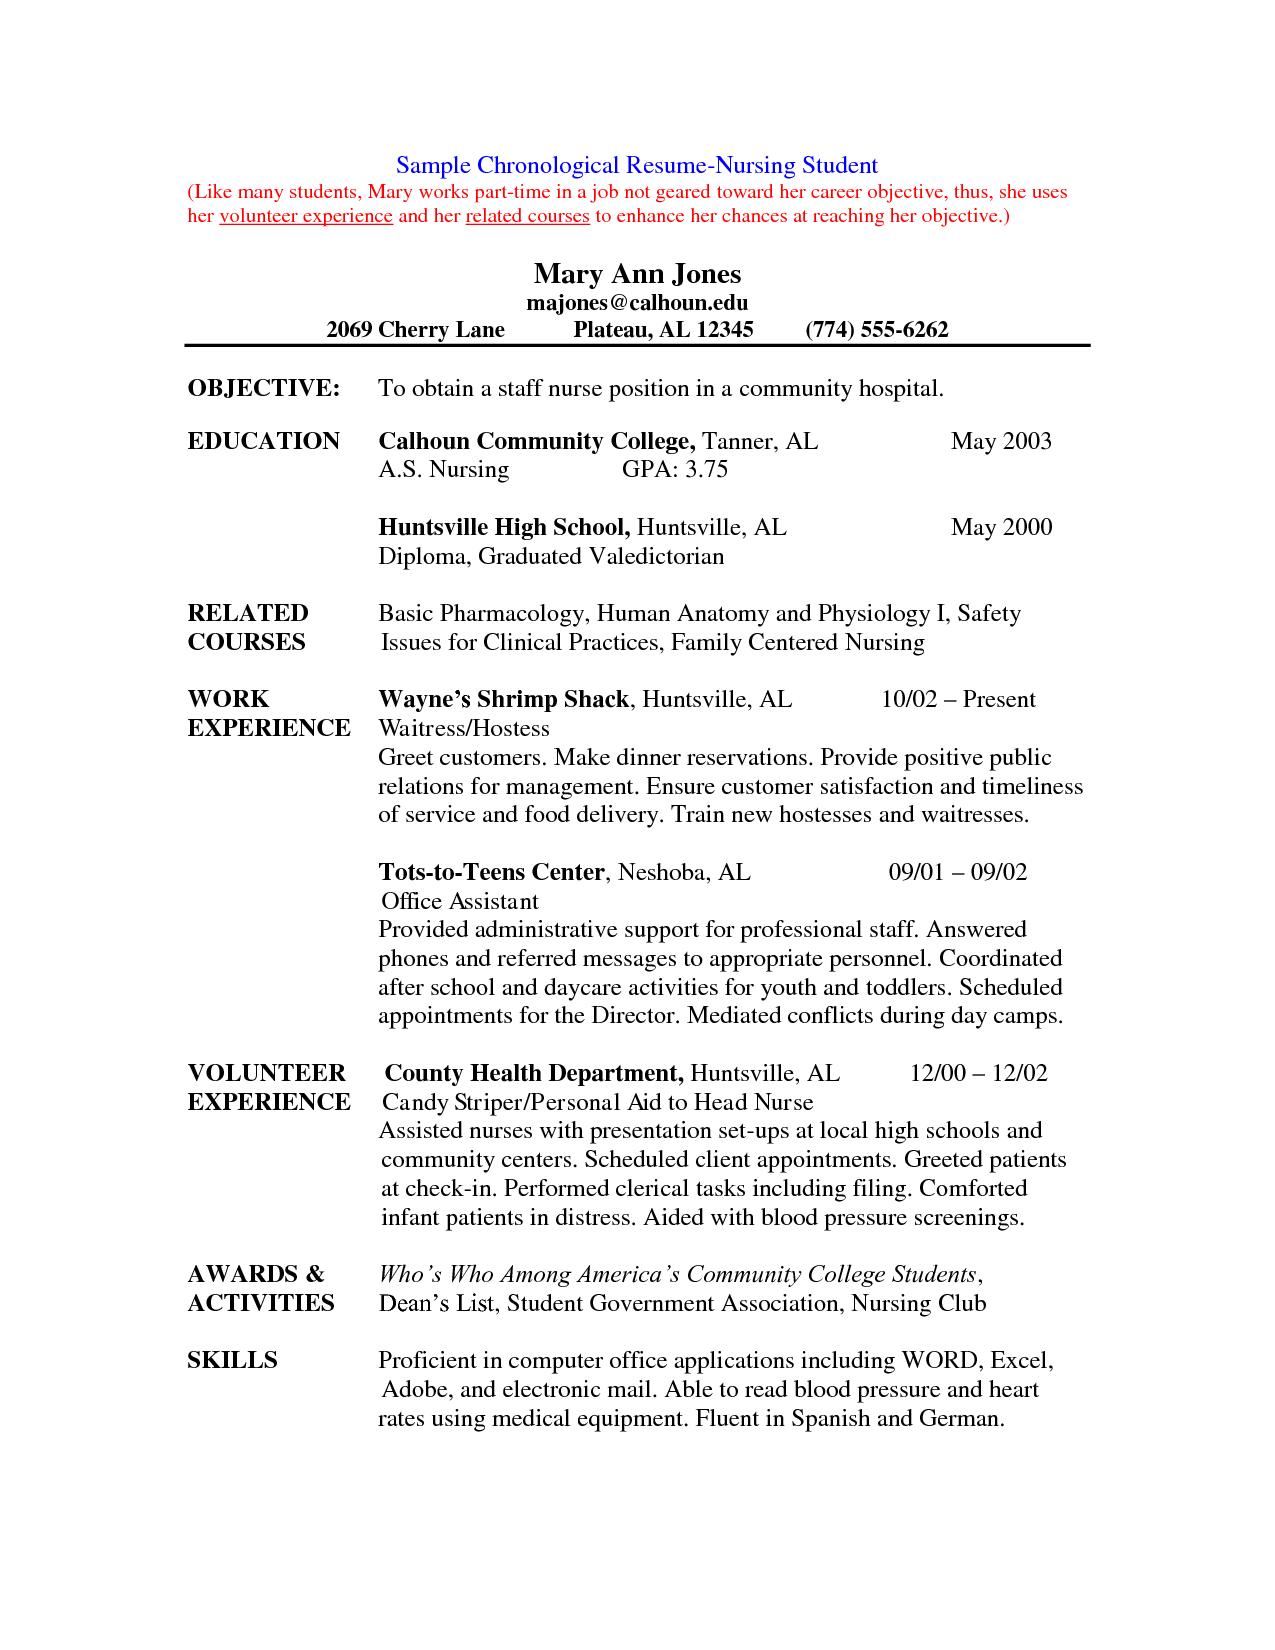 Example Student Nurse Resume.